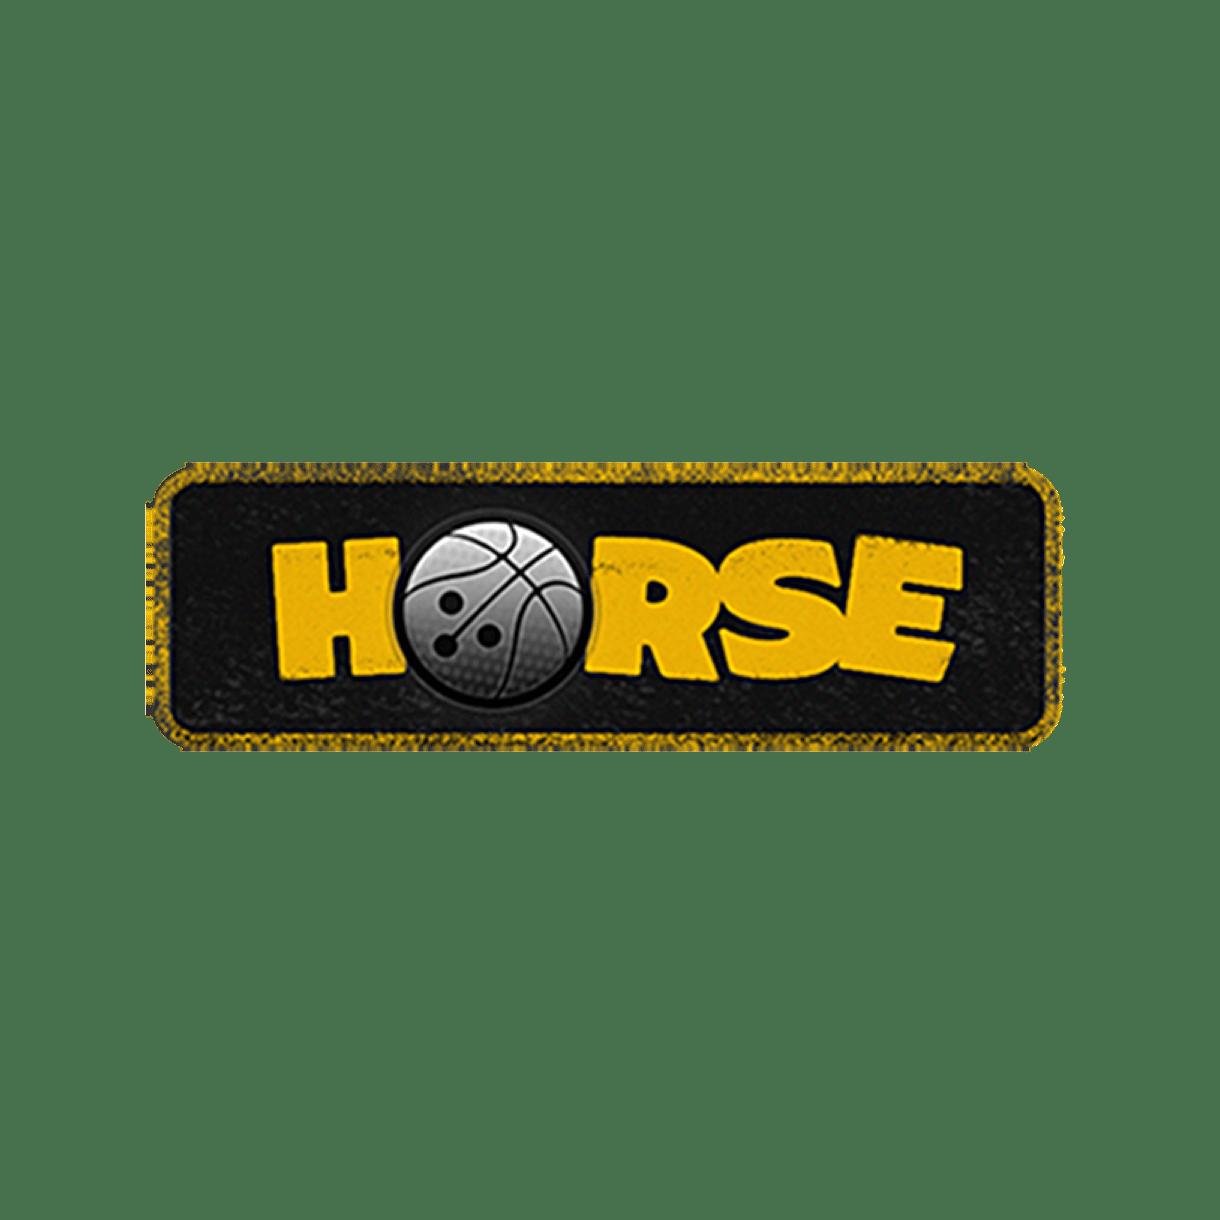 horse-logo-1